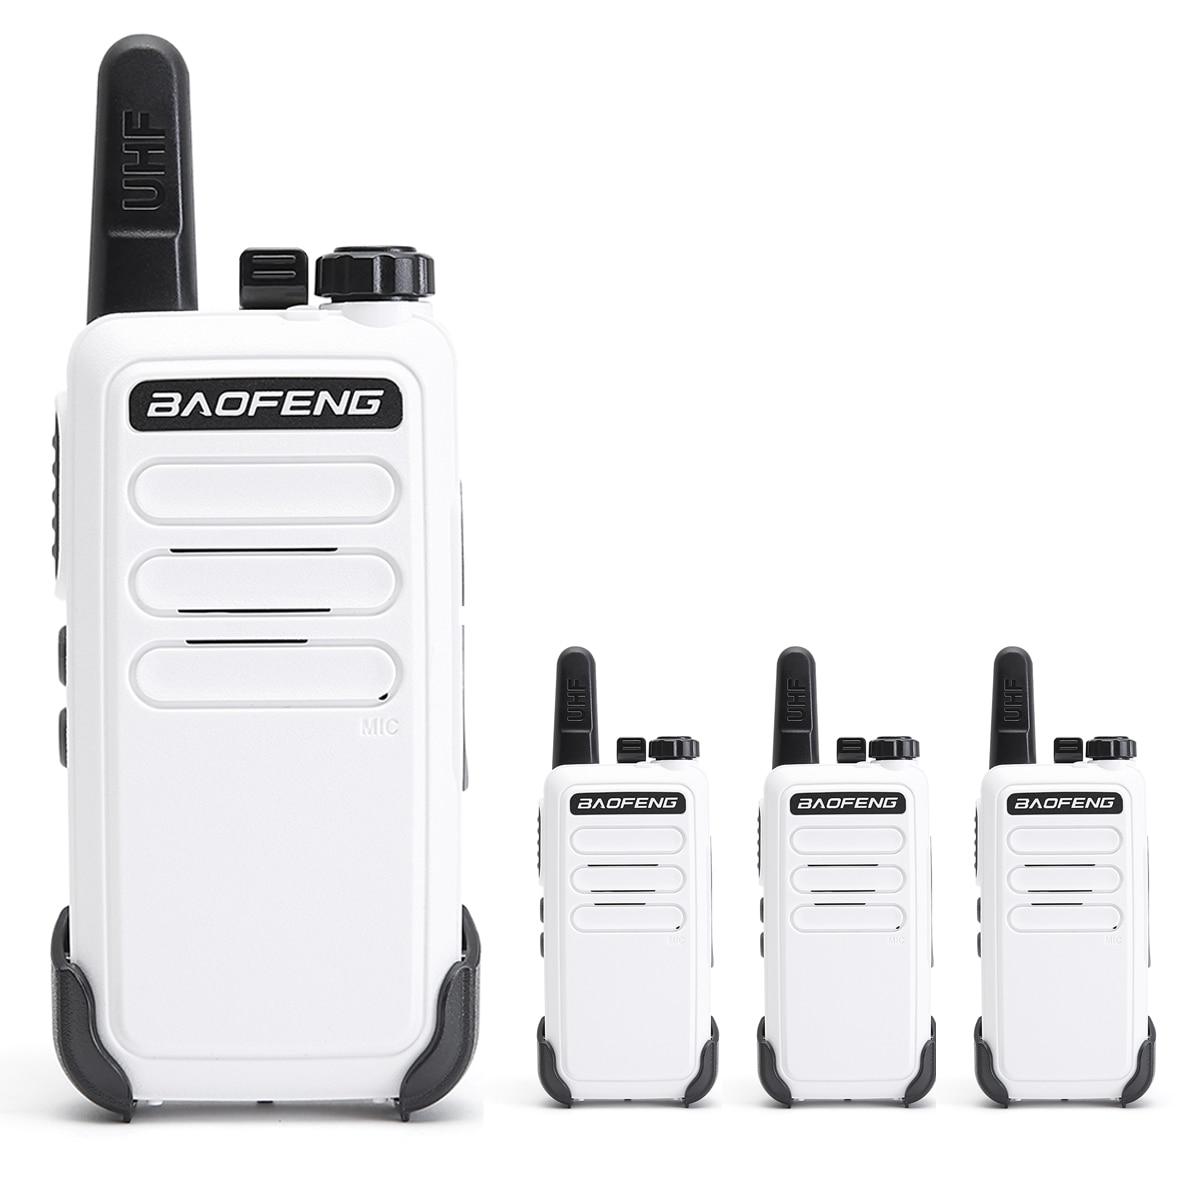 Baofeng Transceiver Walkie-Talkie VOX Two-Way-Radio Mini UHF Handheld Portable BF-C9